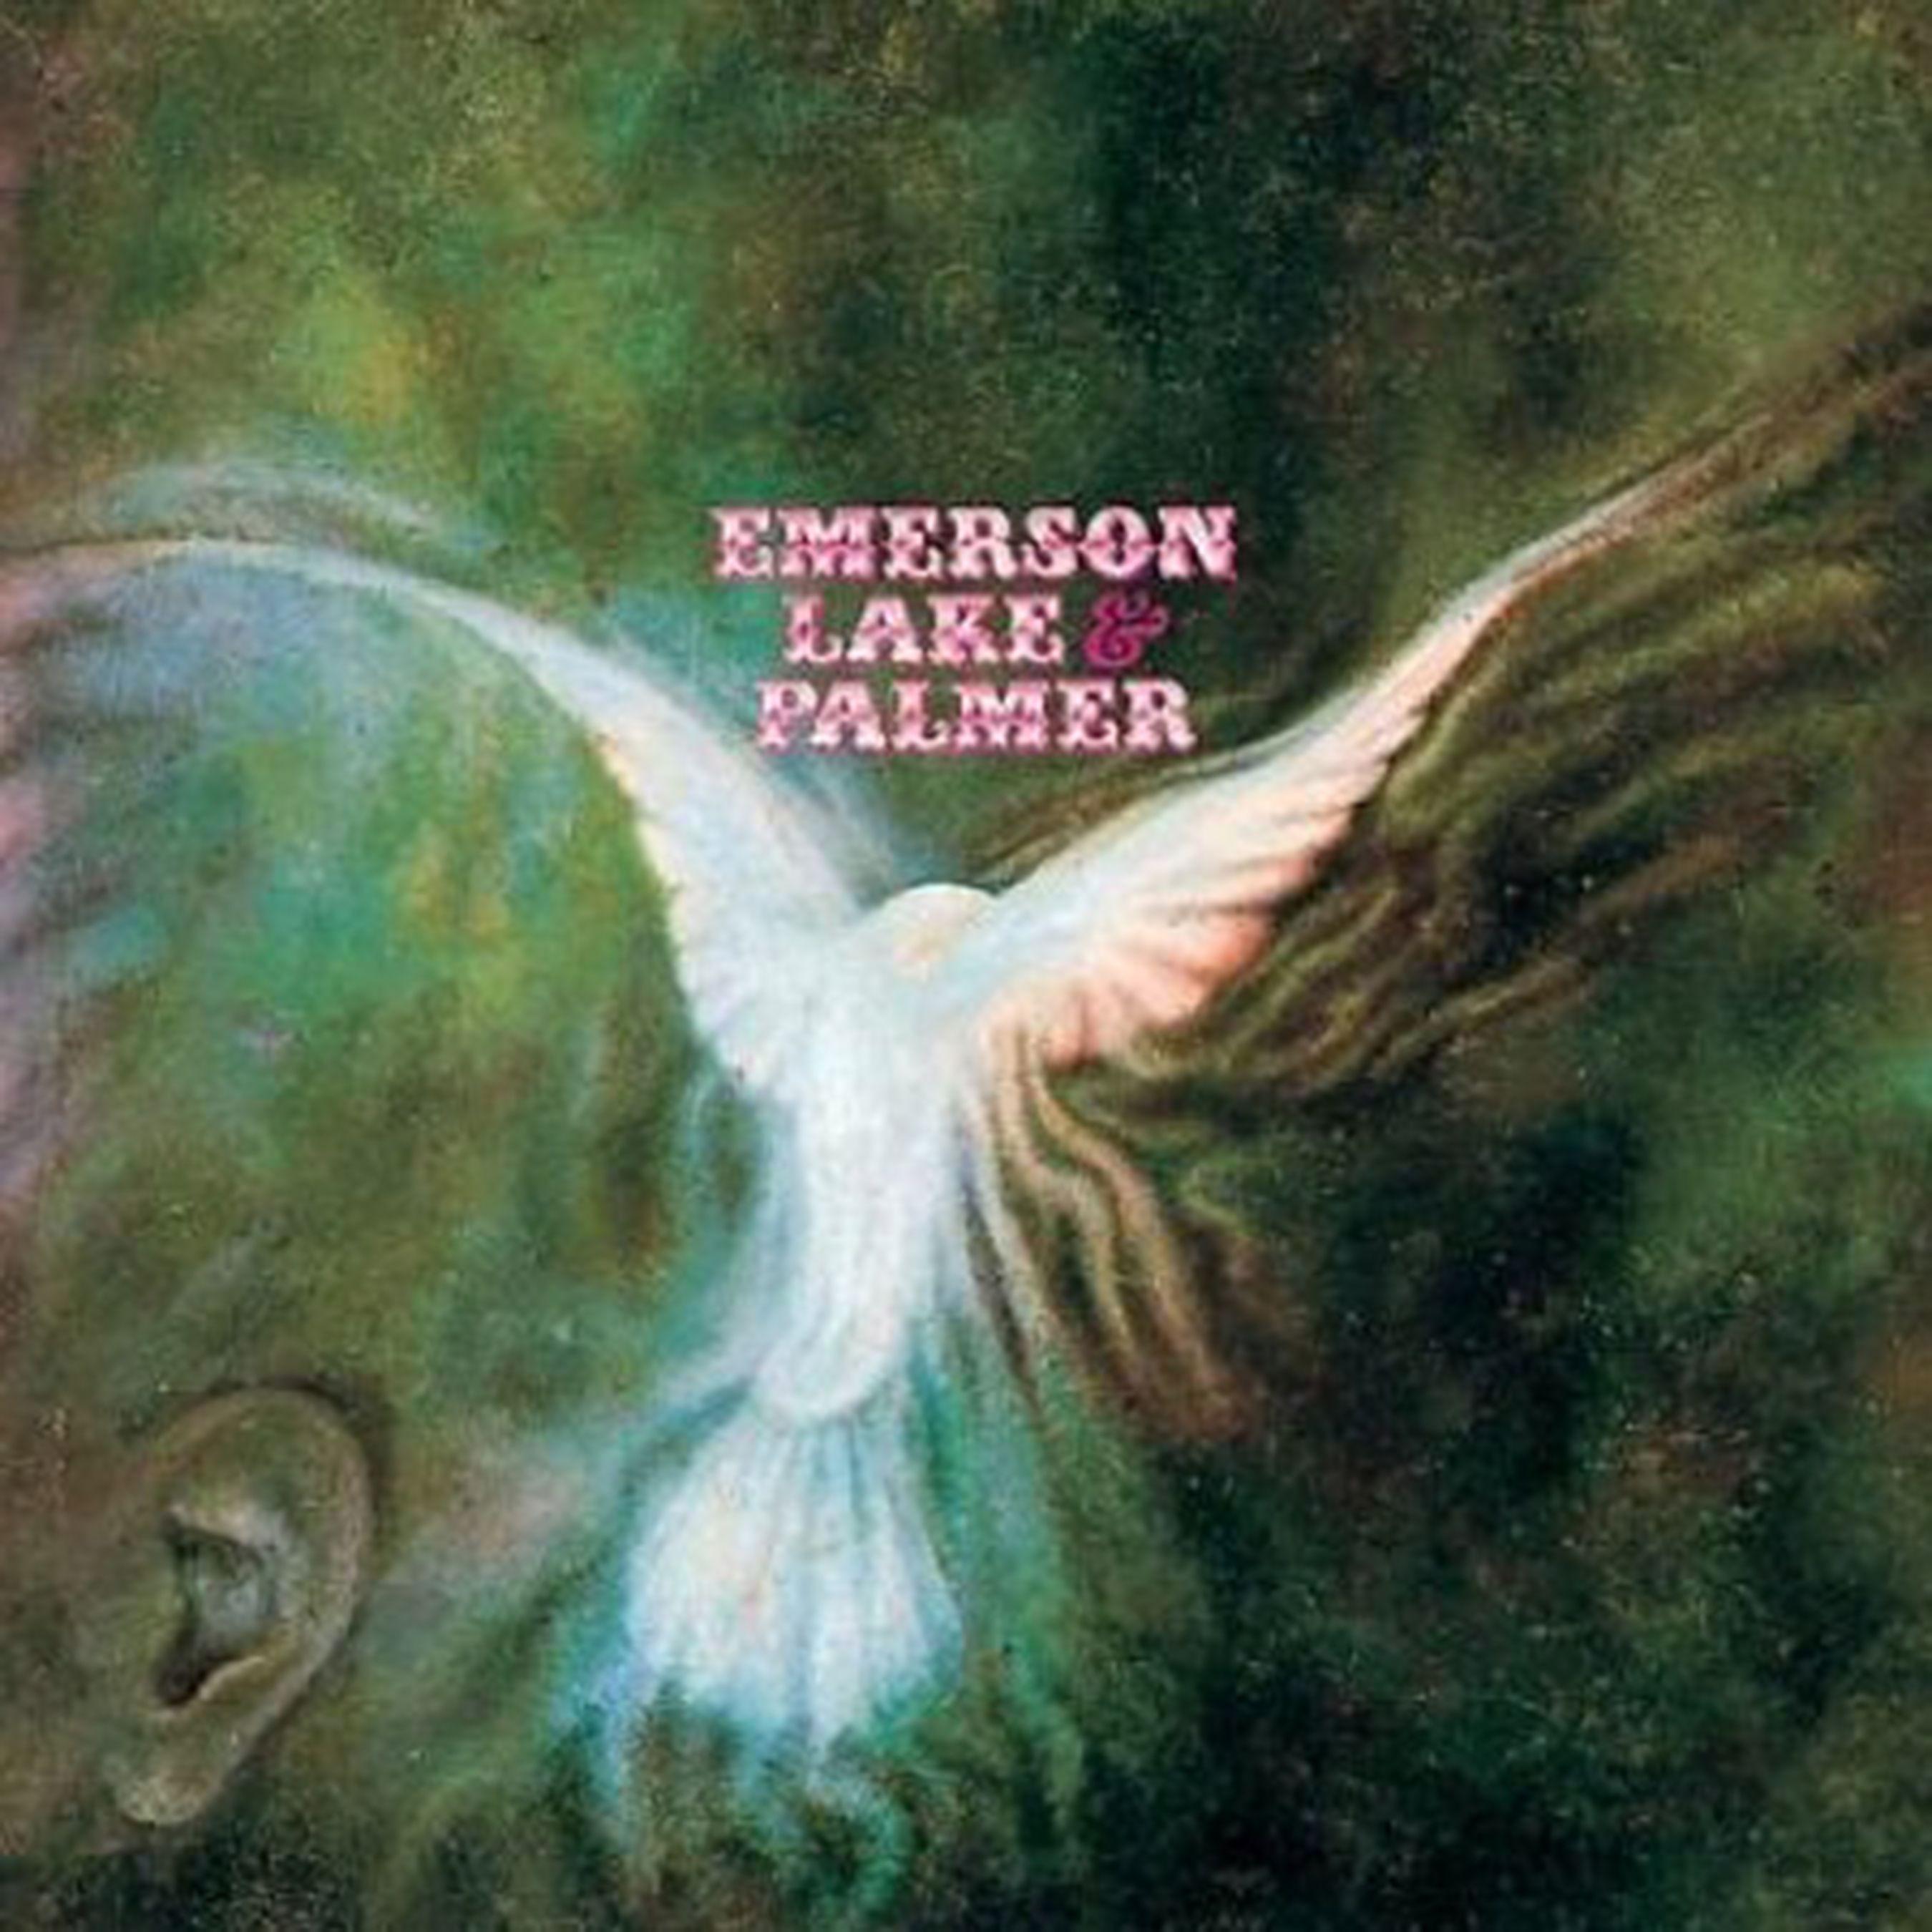 1970 S Historic Classic Rock Albums Emerson Lake Palmer January Classic Rock Albums Rock Album Covers Emerson Lake Palmer